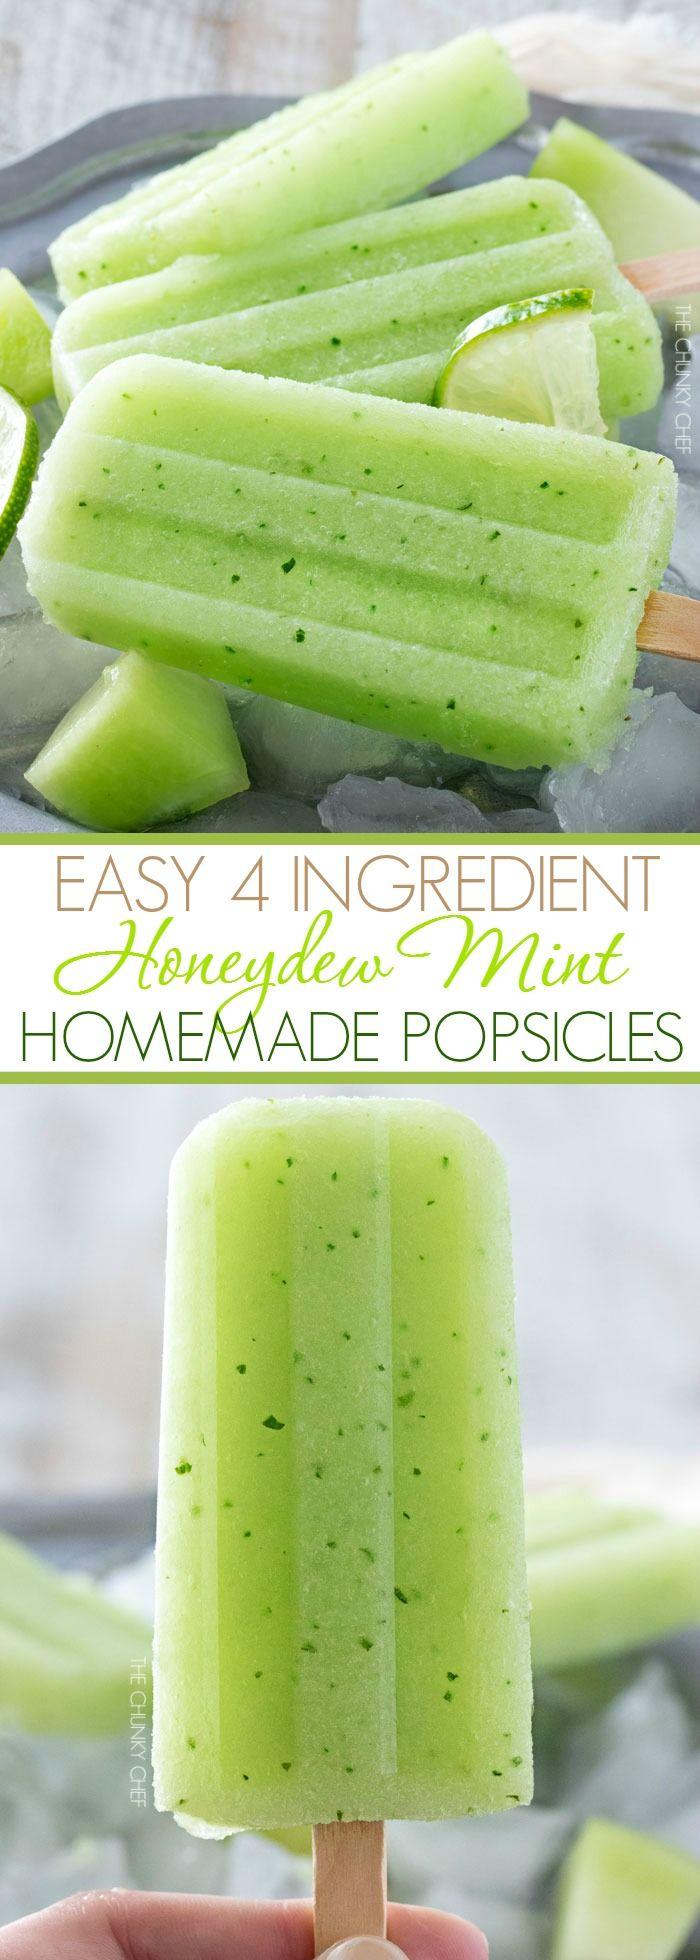 4 Ingredient Honeydew Mint Homemade Popsicles #homemadepopsicleshealthy